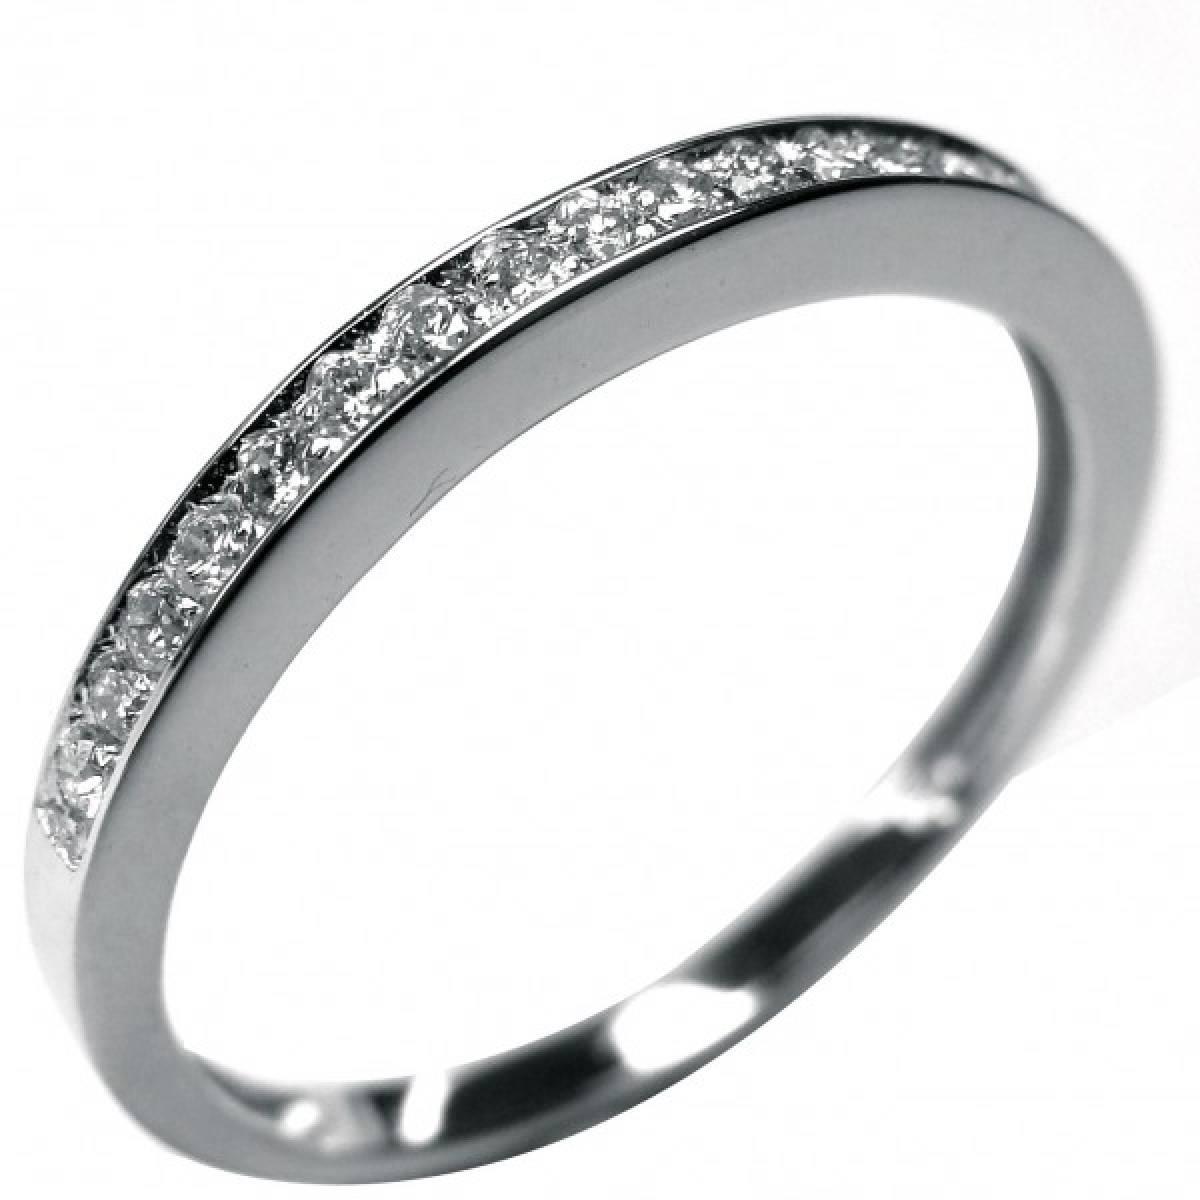 Anel de Noivado ouro branco de 19 kts, com 19 diamantes de 0,19 cts